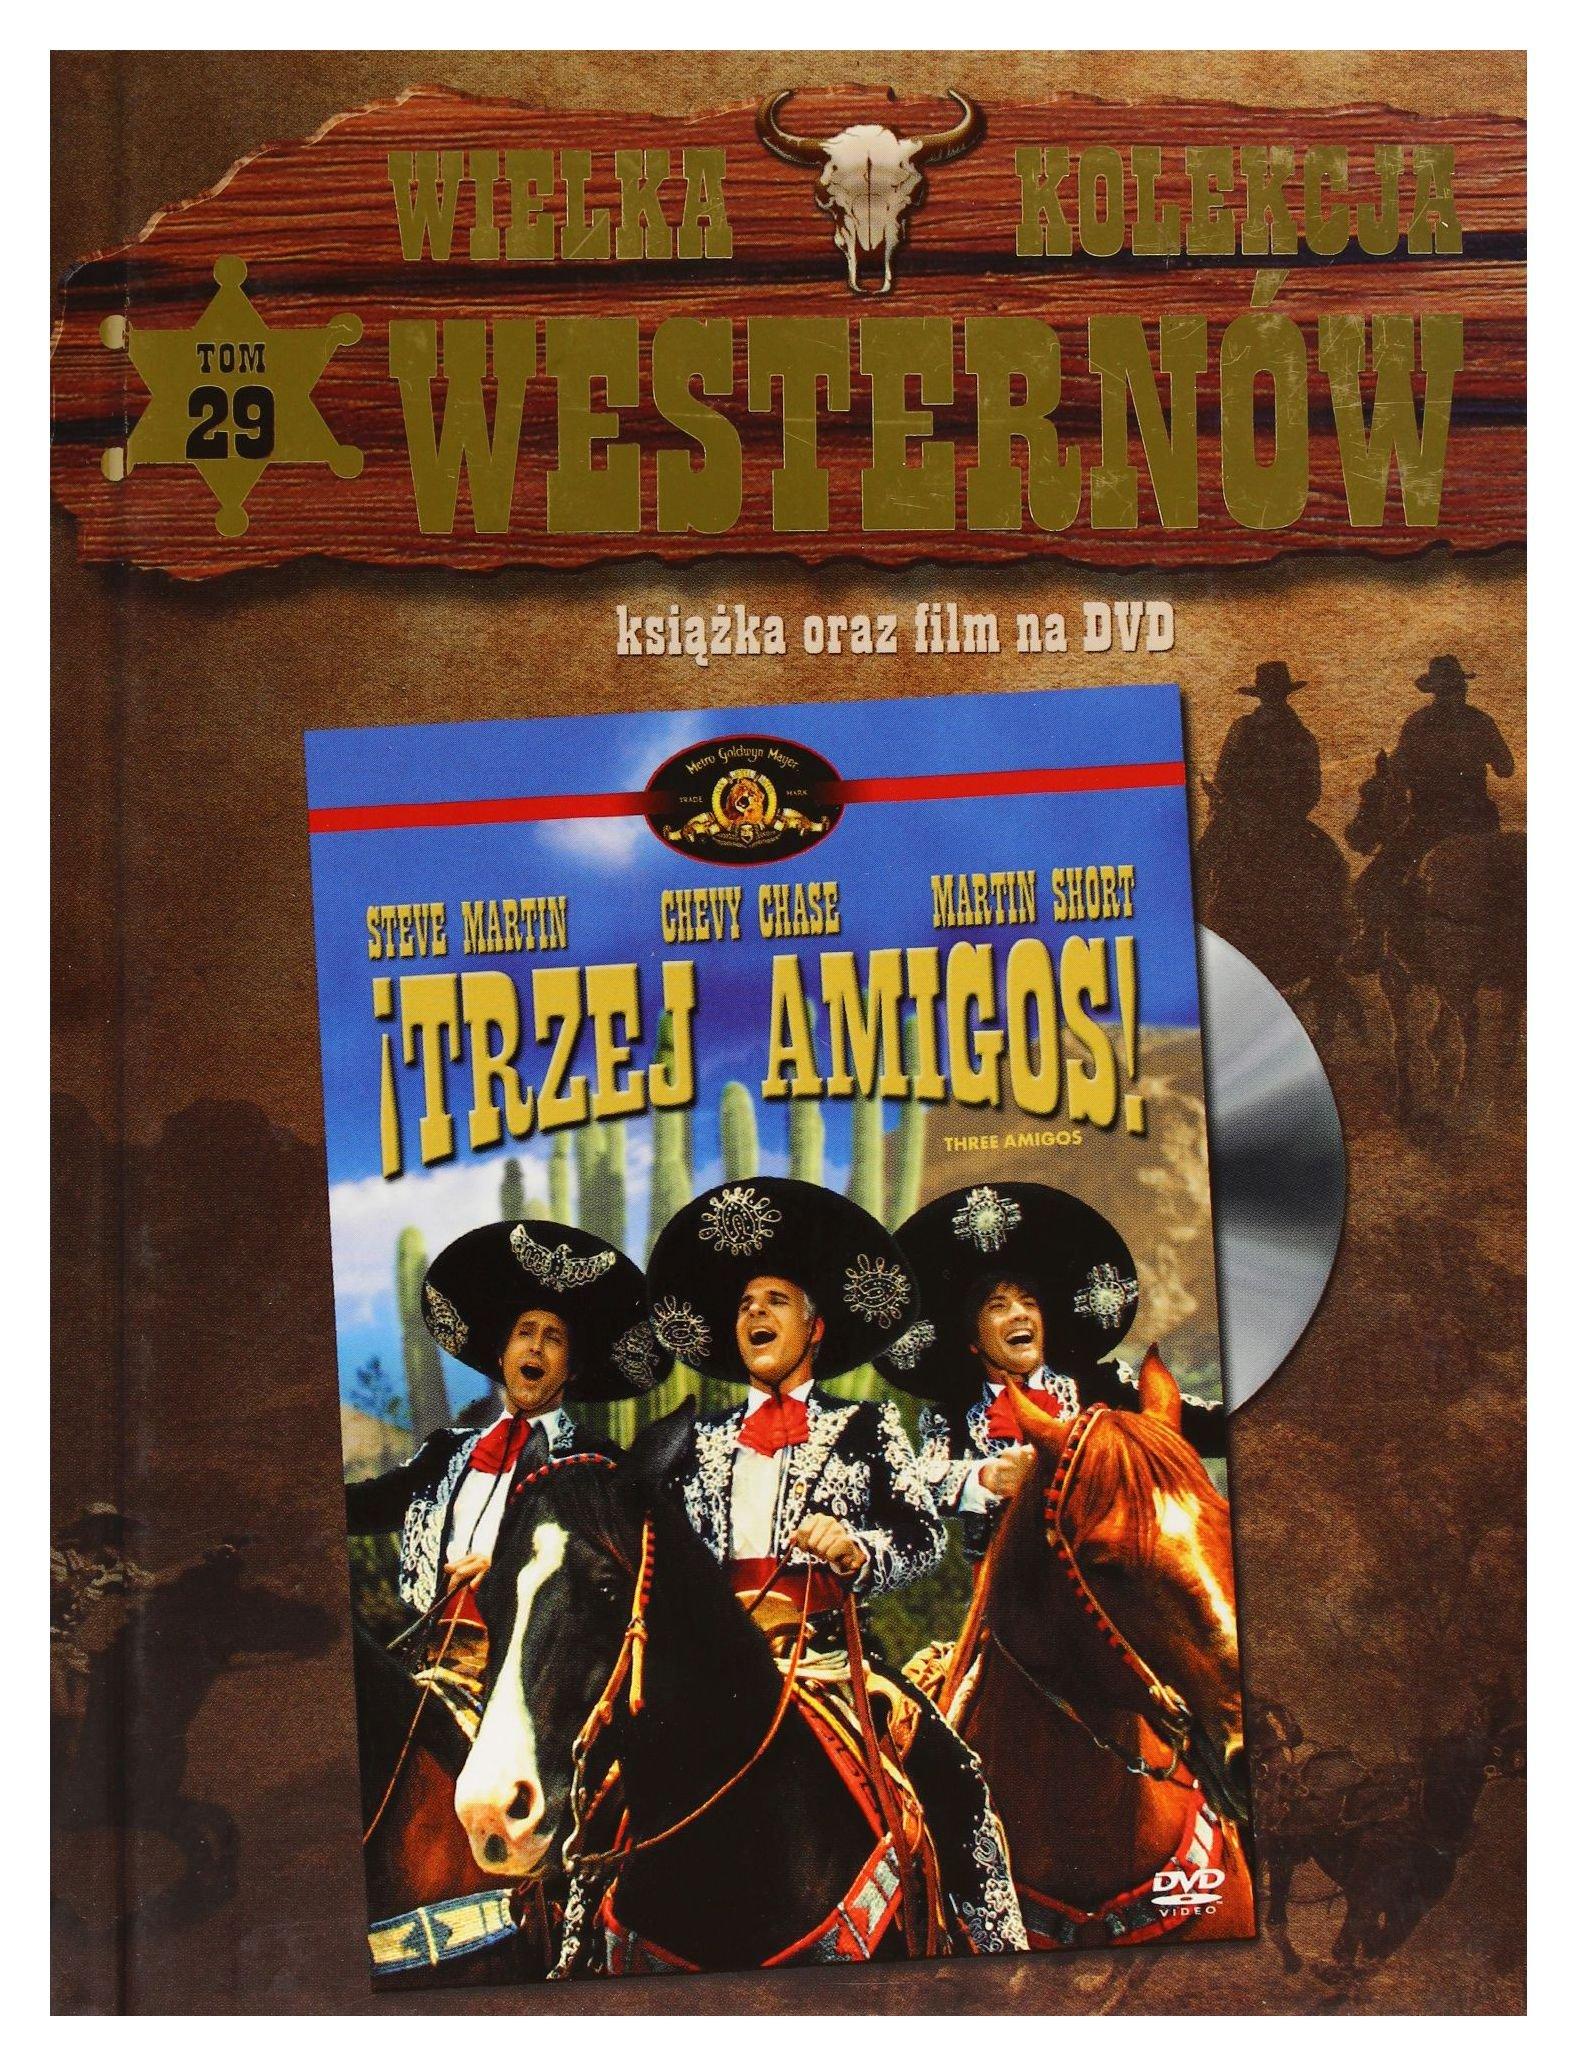 Three Amigos [DVD] (English audio. English subtitles) Chevy Chase